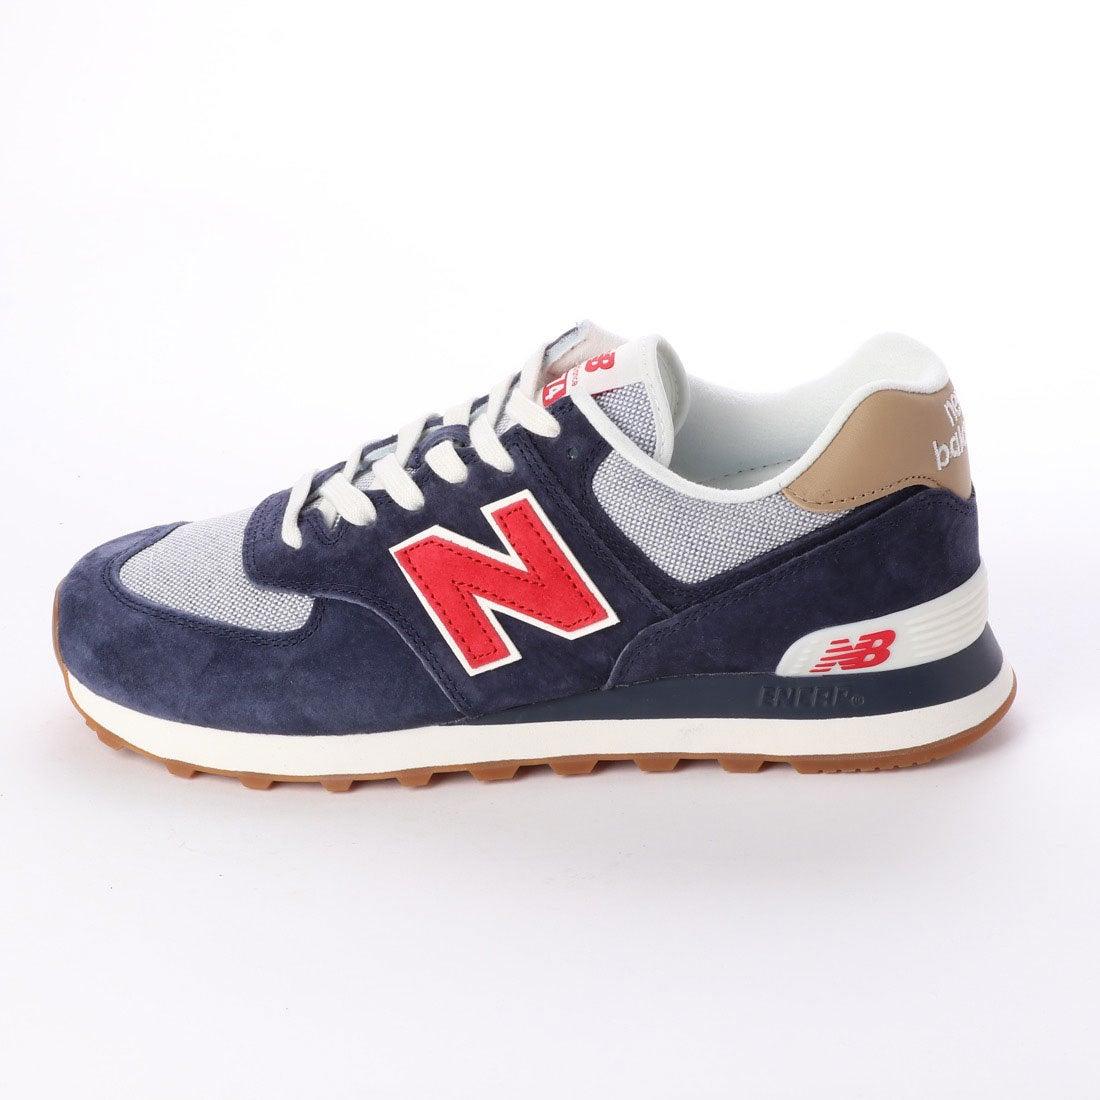 le dernier 5350c ea17f ニューバランス new balance NB ML574 ((PTR)ネイビー)-靴 ...